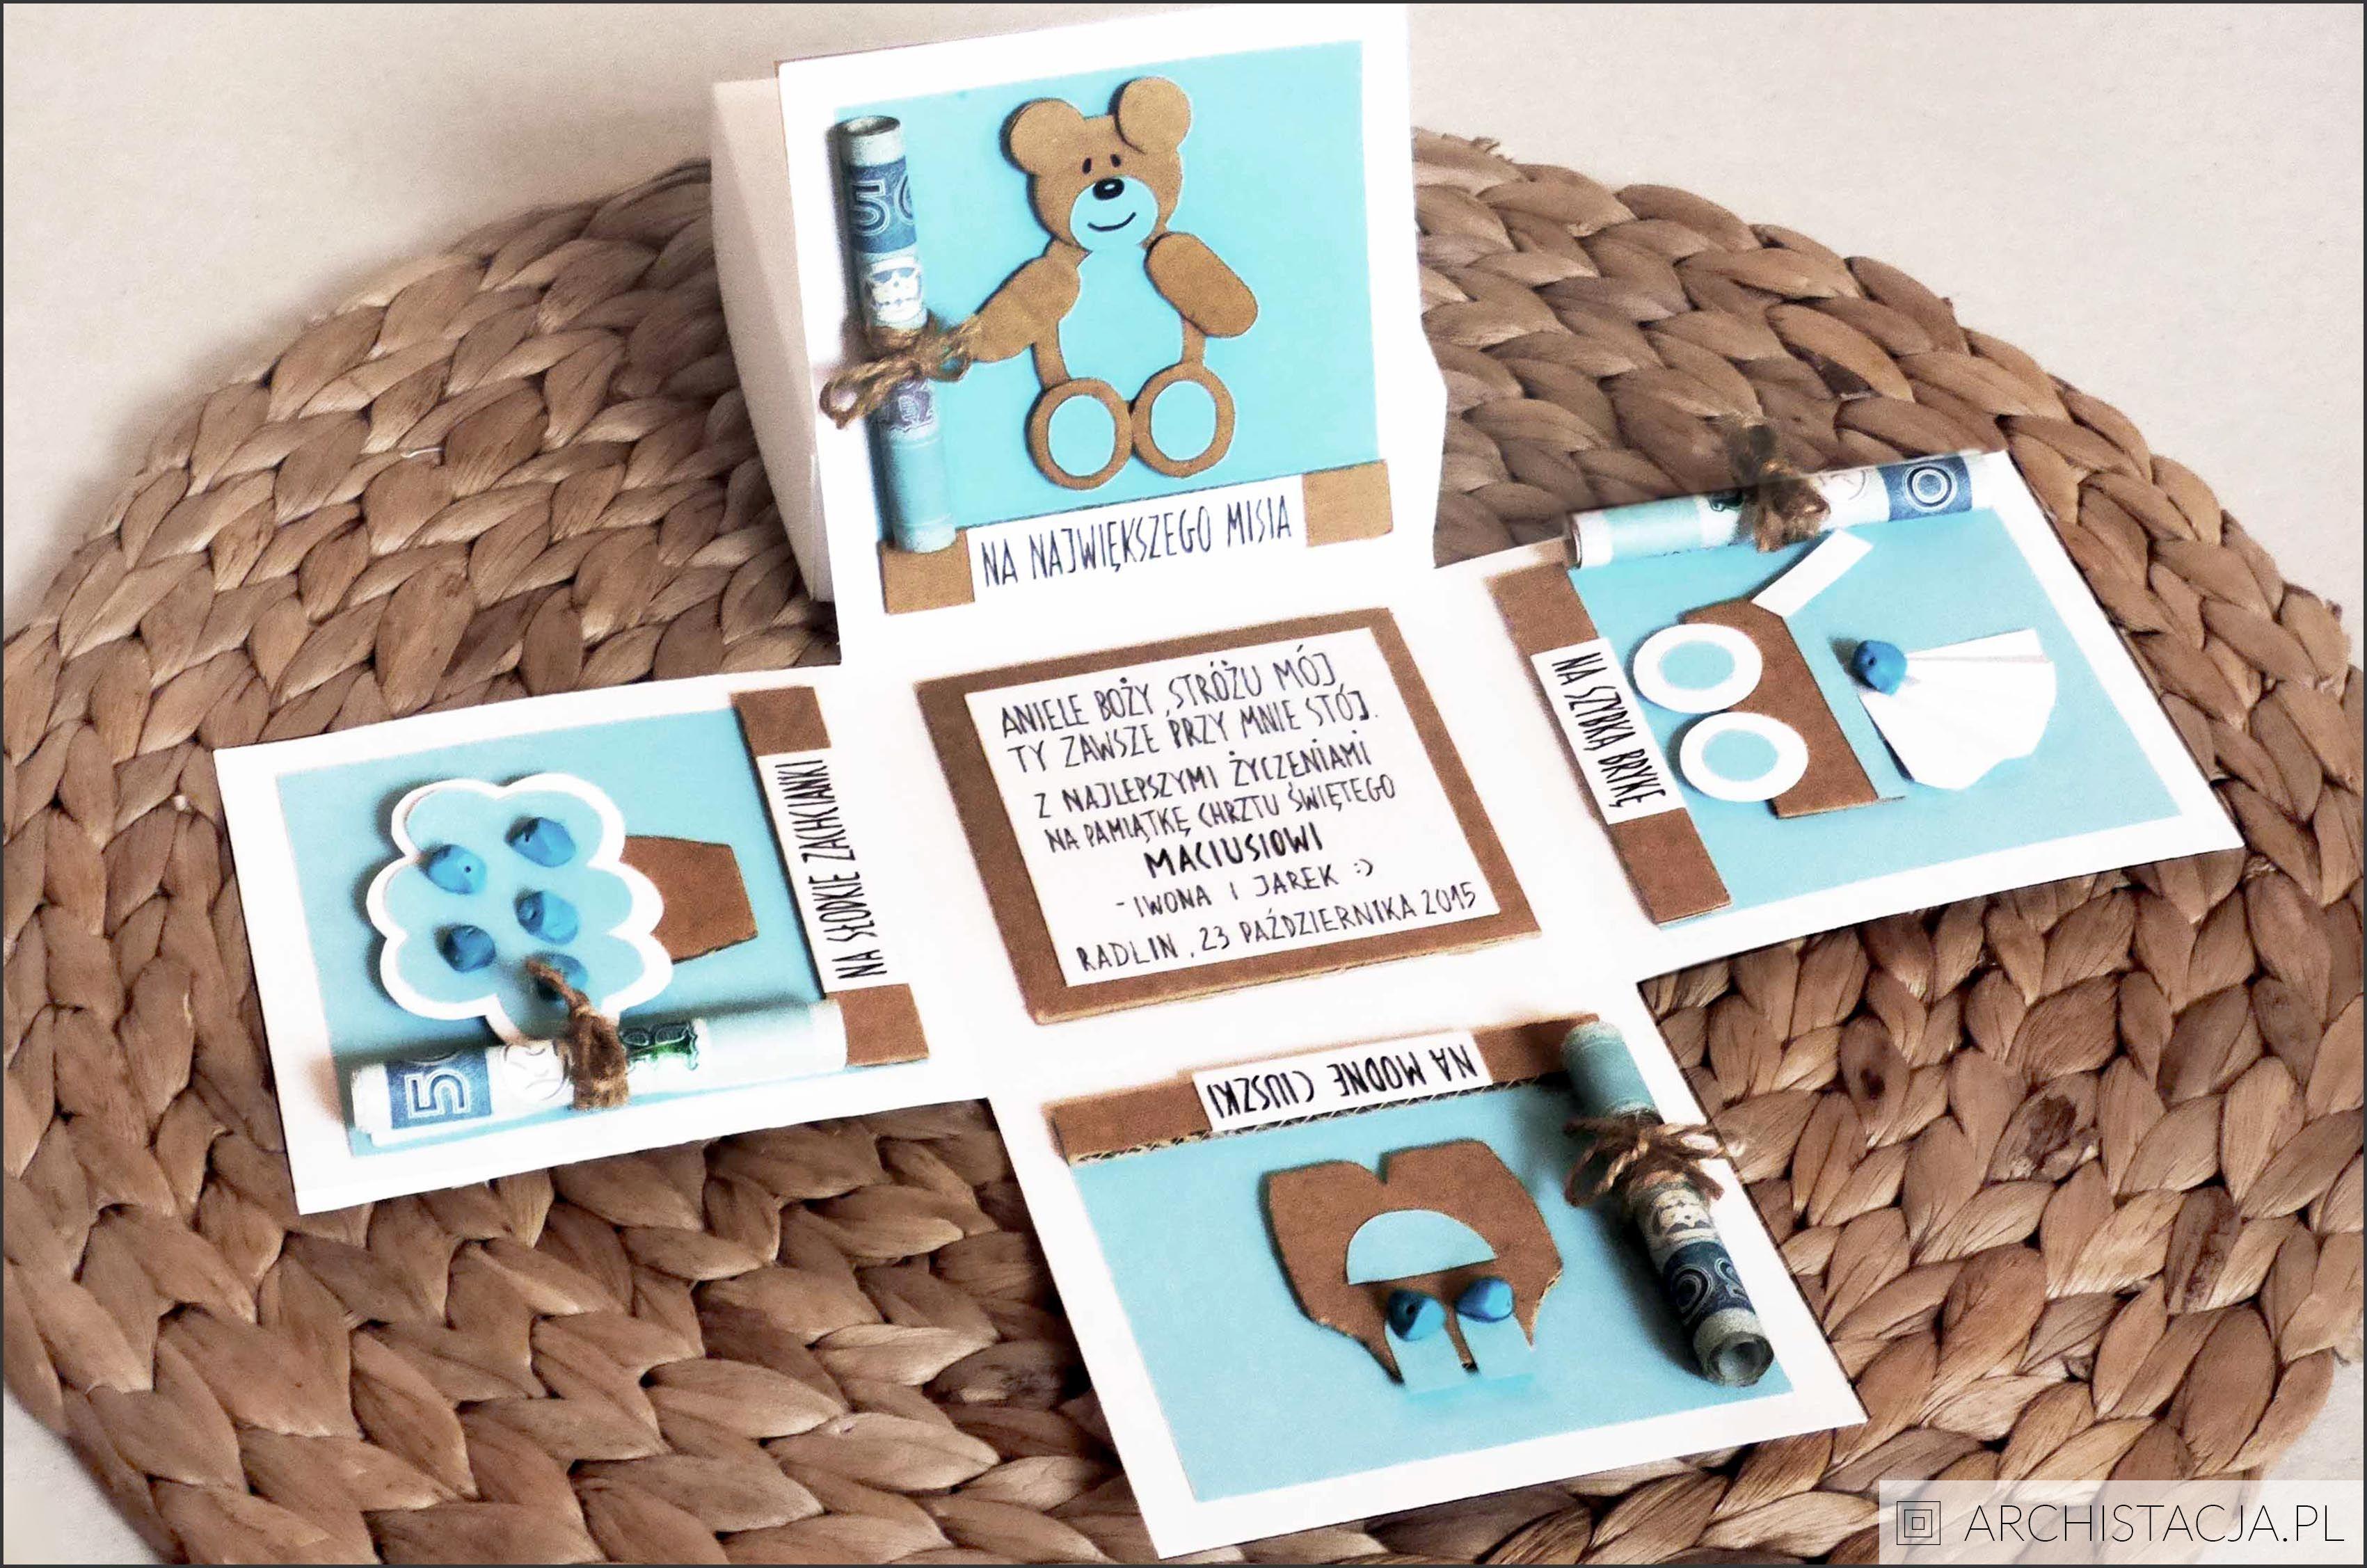 Schemat Kartki Pudelko Diy And Crafts Crafts Diy Projects